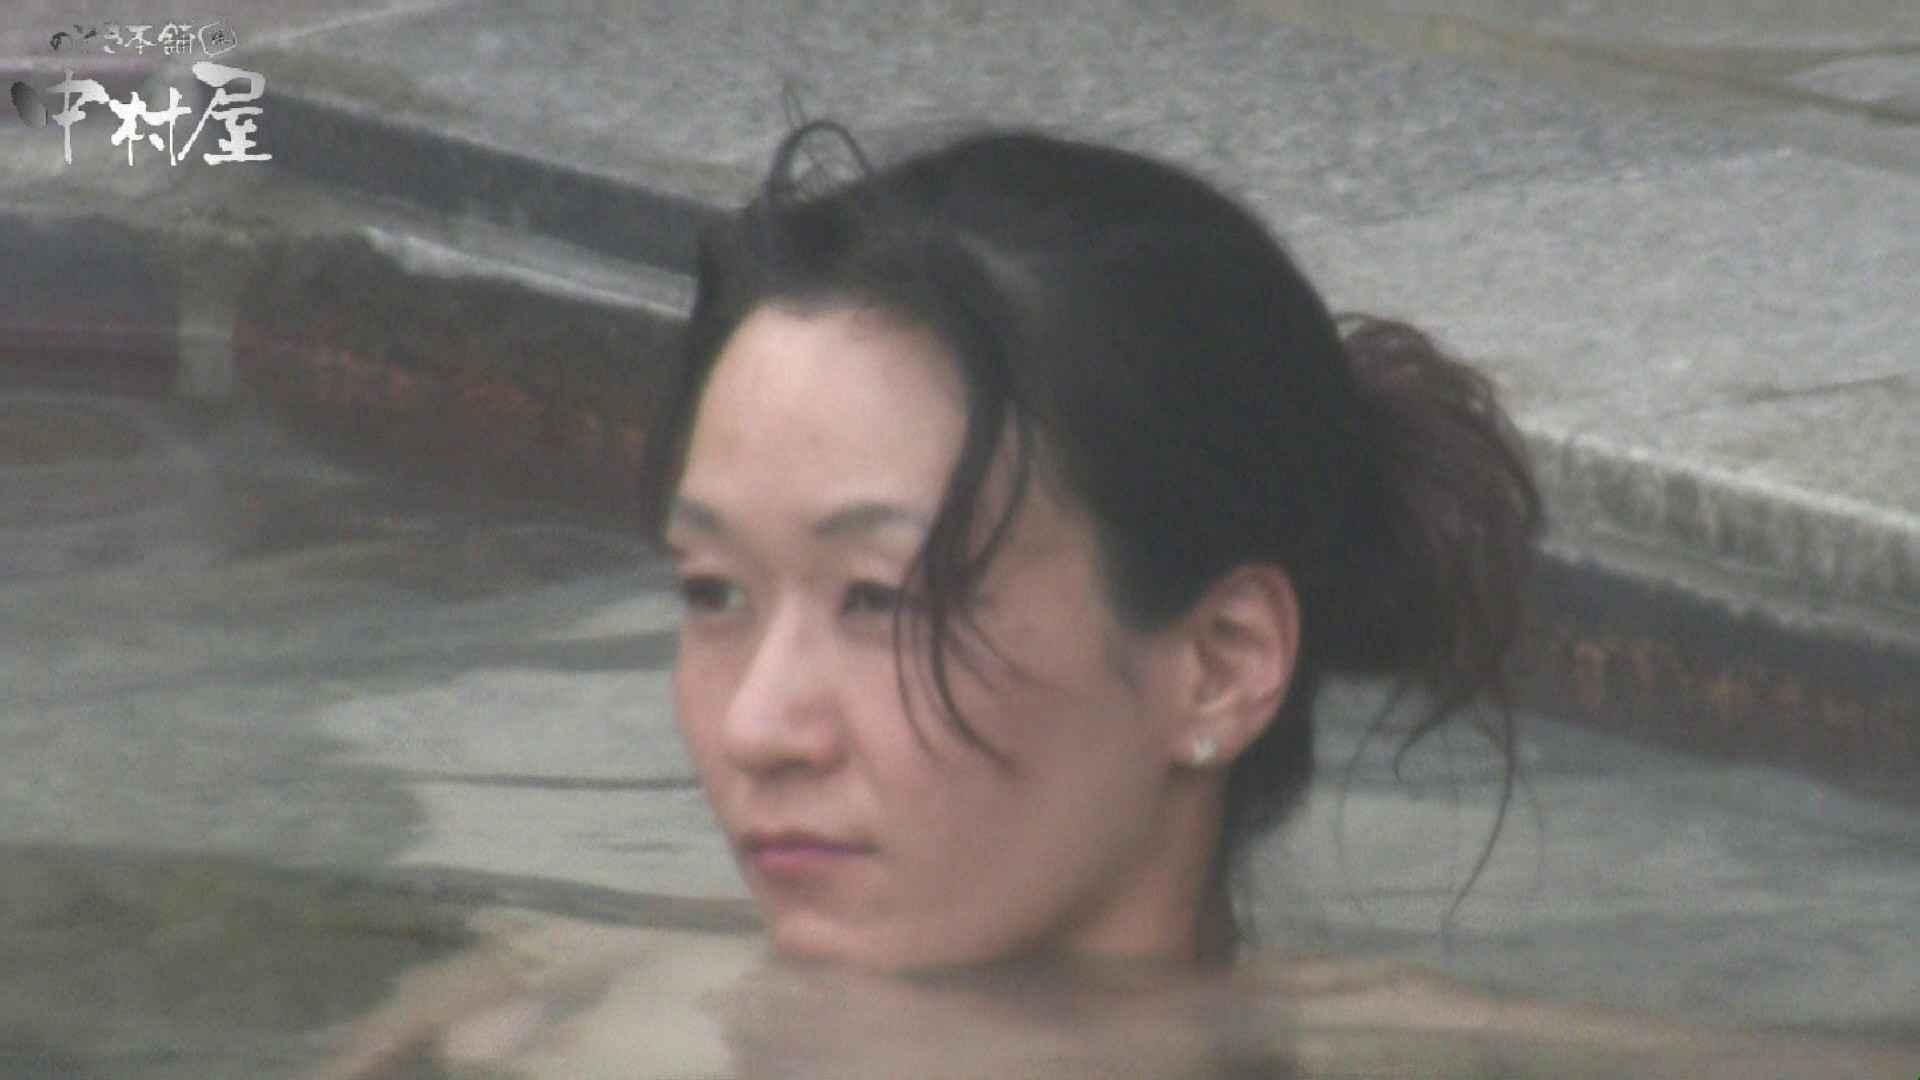 Aquaな露天風呂Vol.928 OLセックス  99画像 78